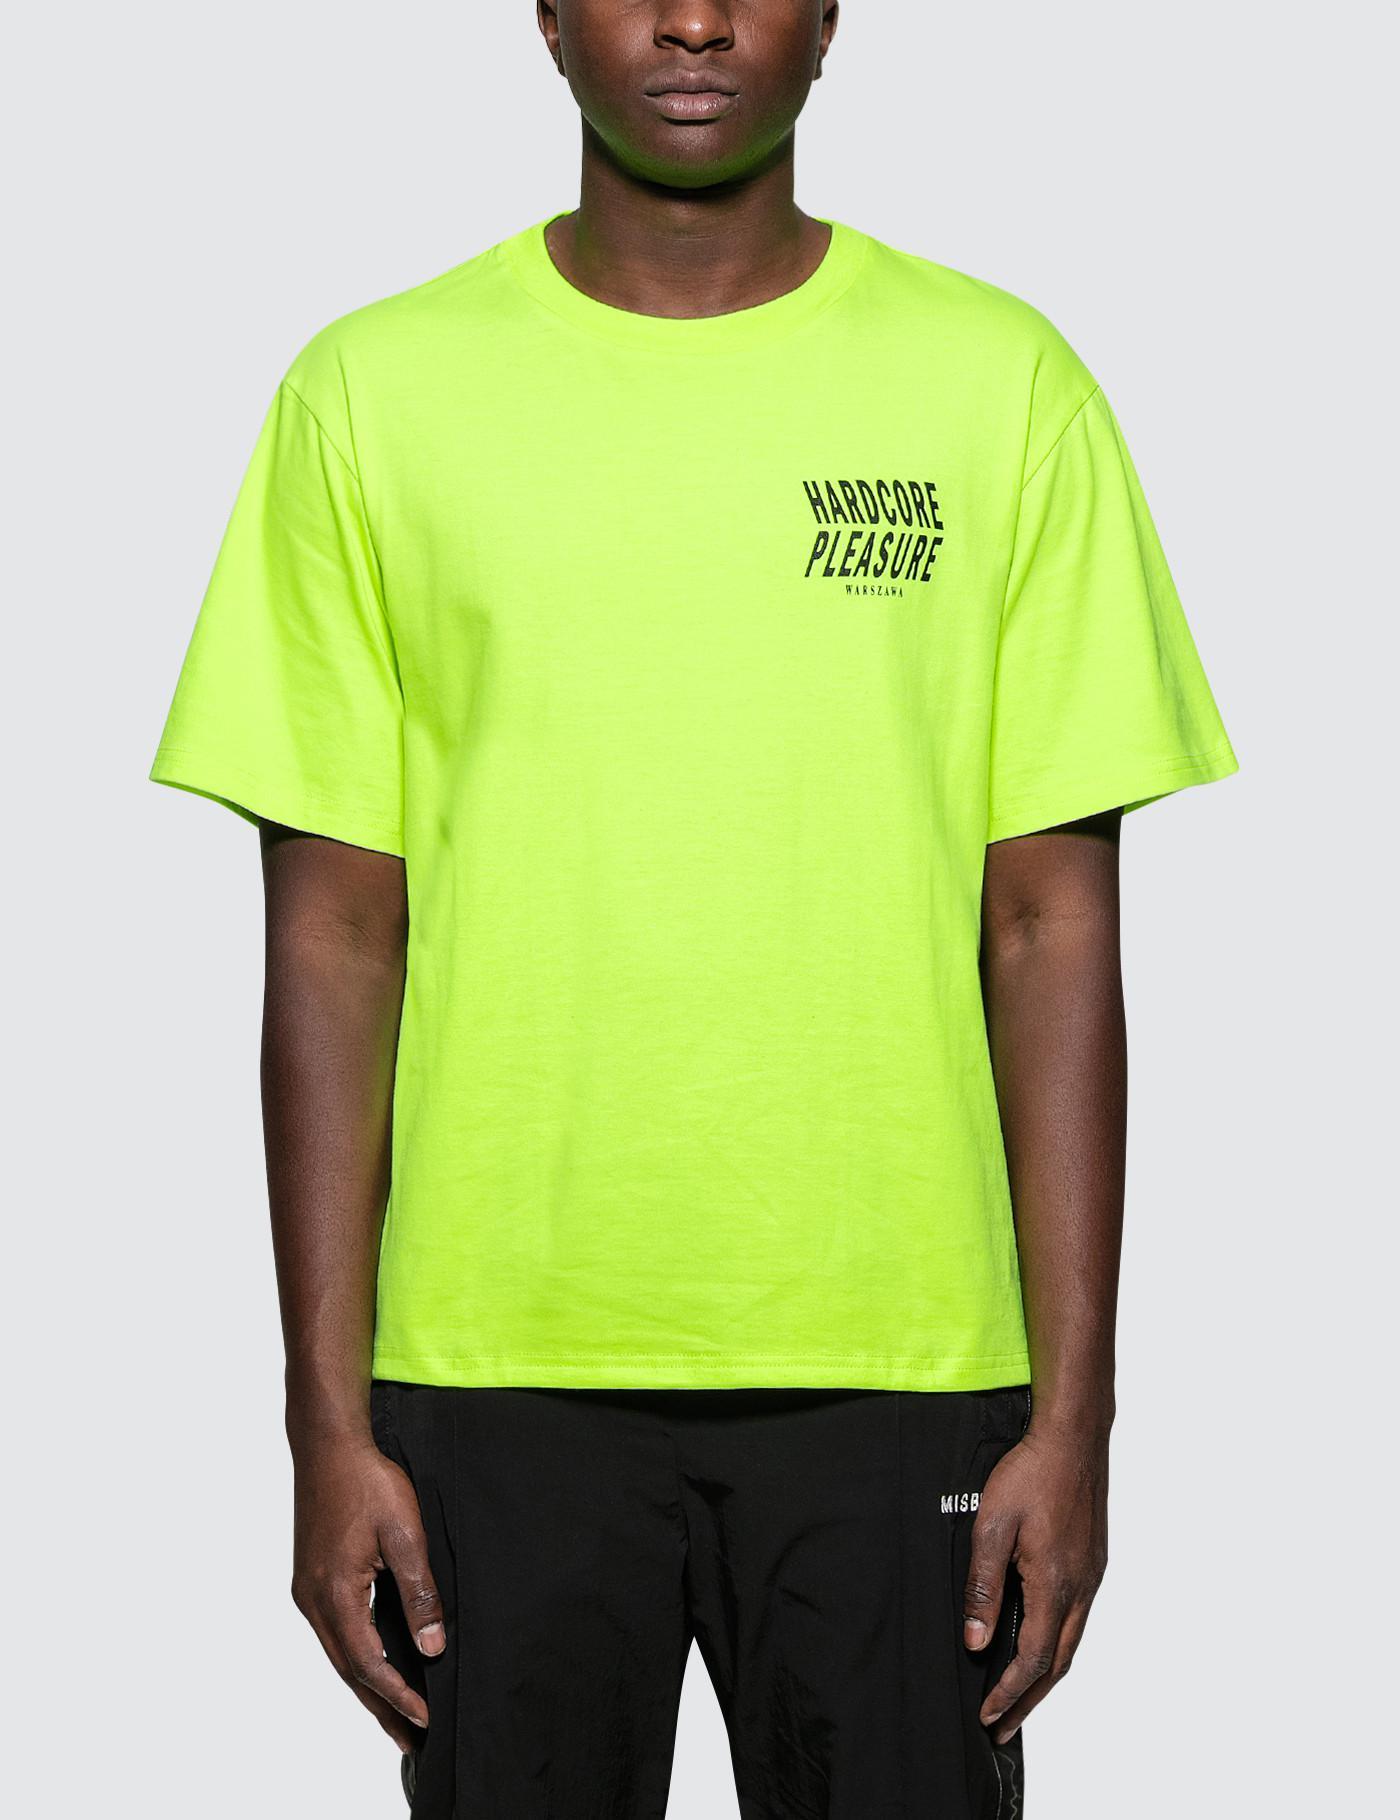 b942f65f MISBHV Hardcore Pleasure 2018 S/s T-shirt in Green for Men - Lyst